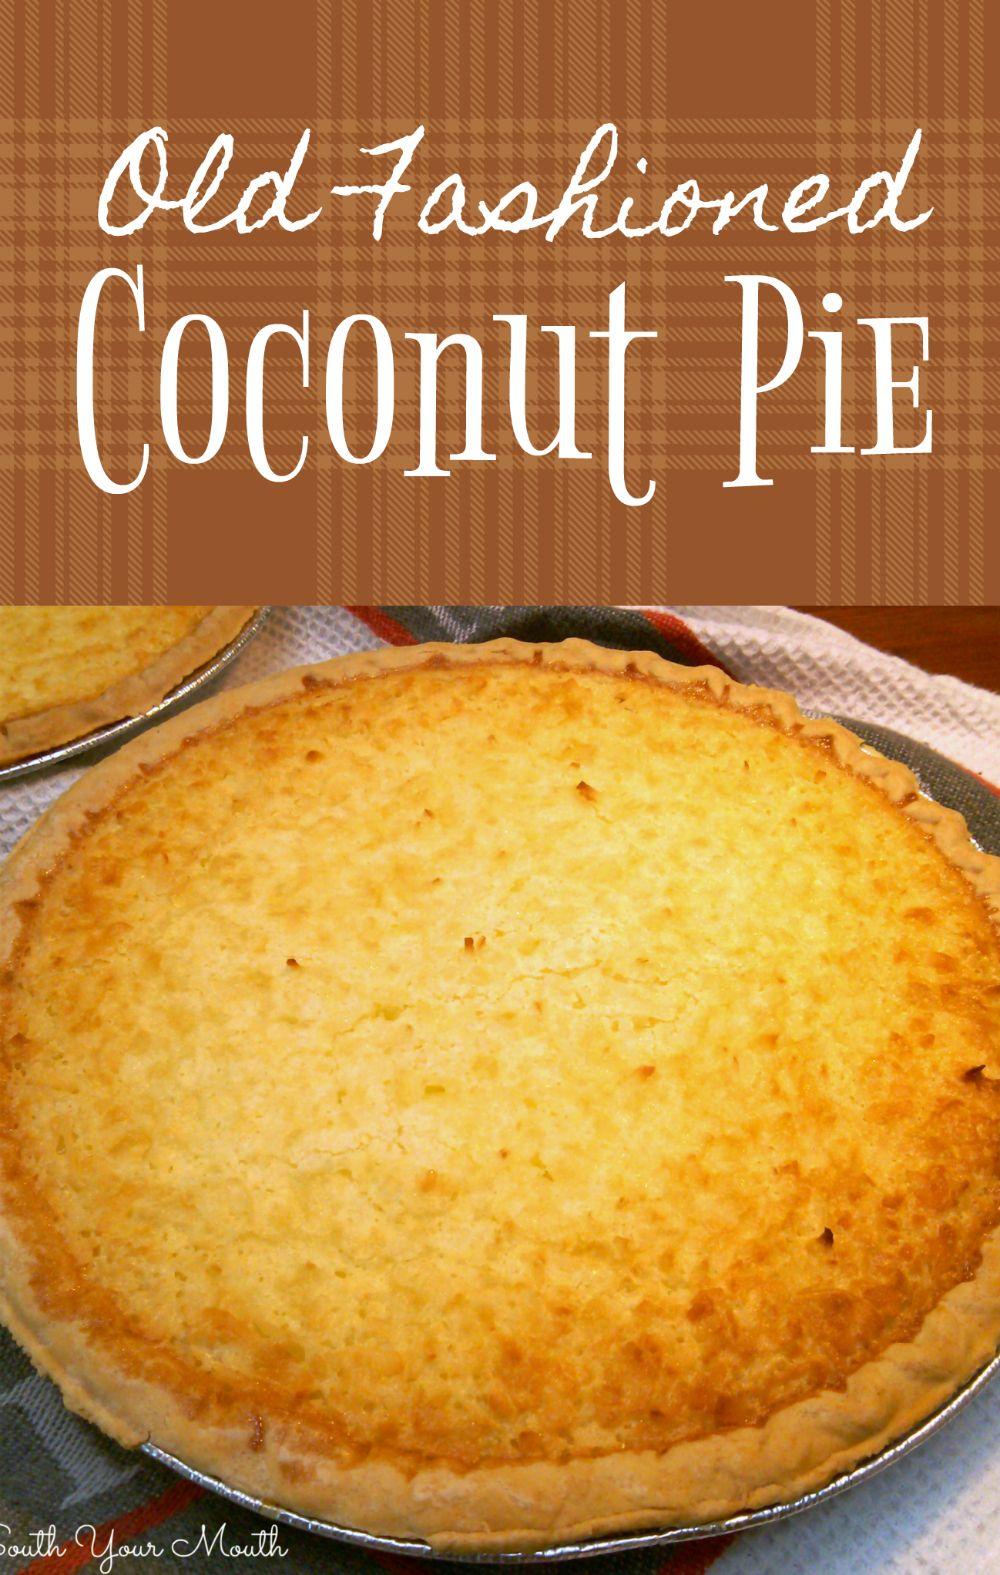 Old Fashioned Coconut Pie A Classic Custard Pie With Coconut Coconut Pie Recipe French Coconut Pie Coconut Pie